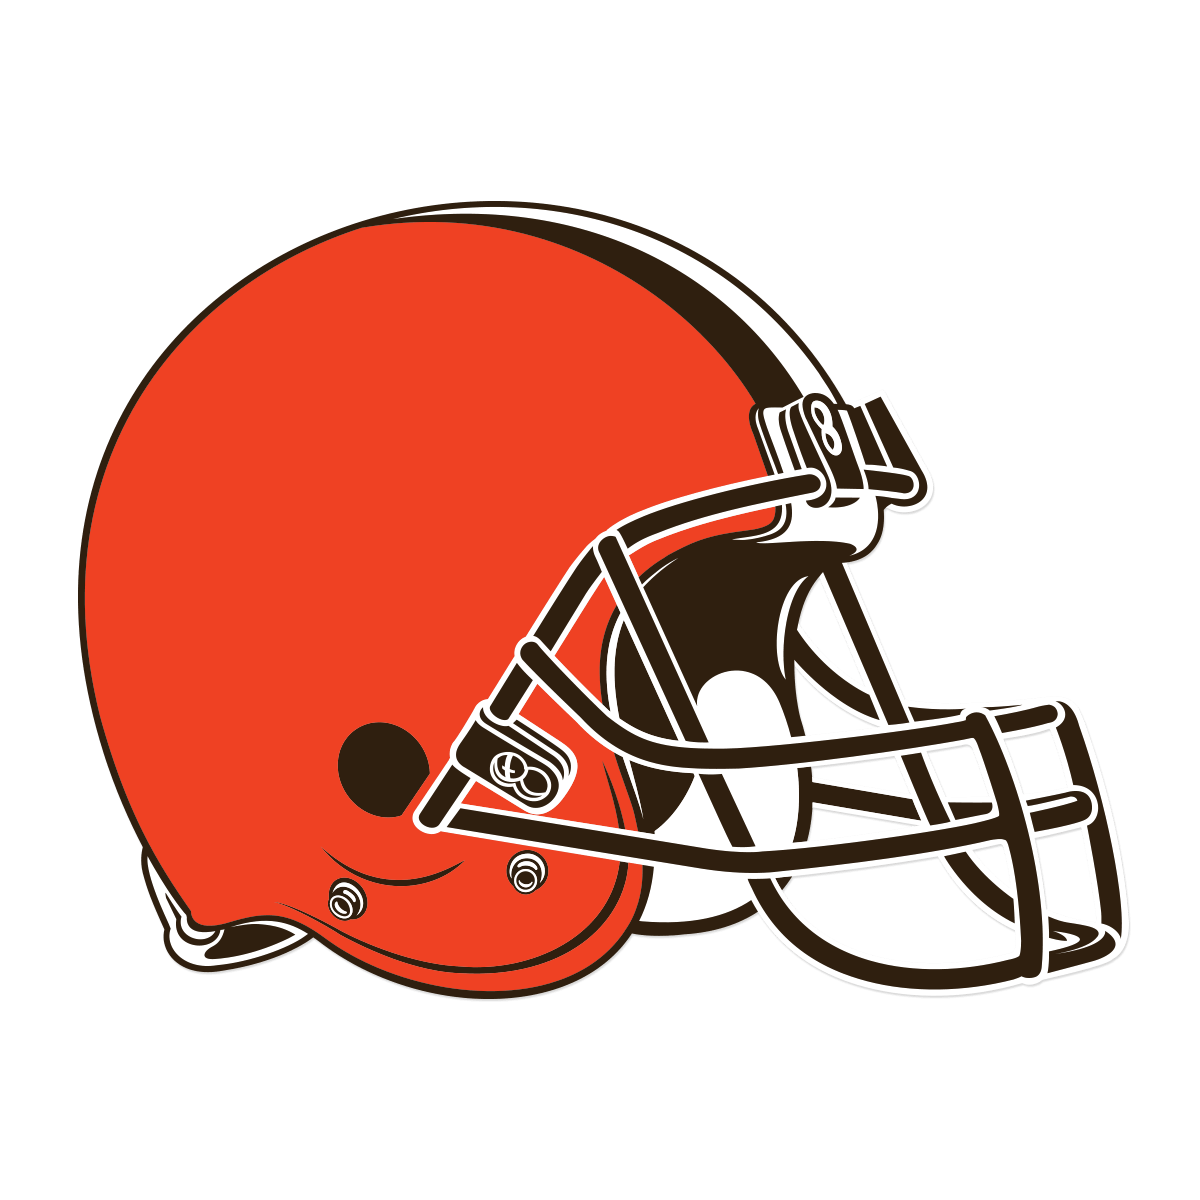 Football stat clipboard clipart clip art transparent 2015 vs 2014 Browns logo animated GIF comparison : nfl clip art transparent